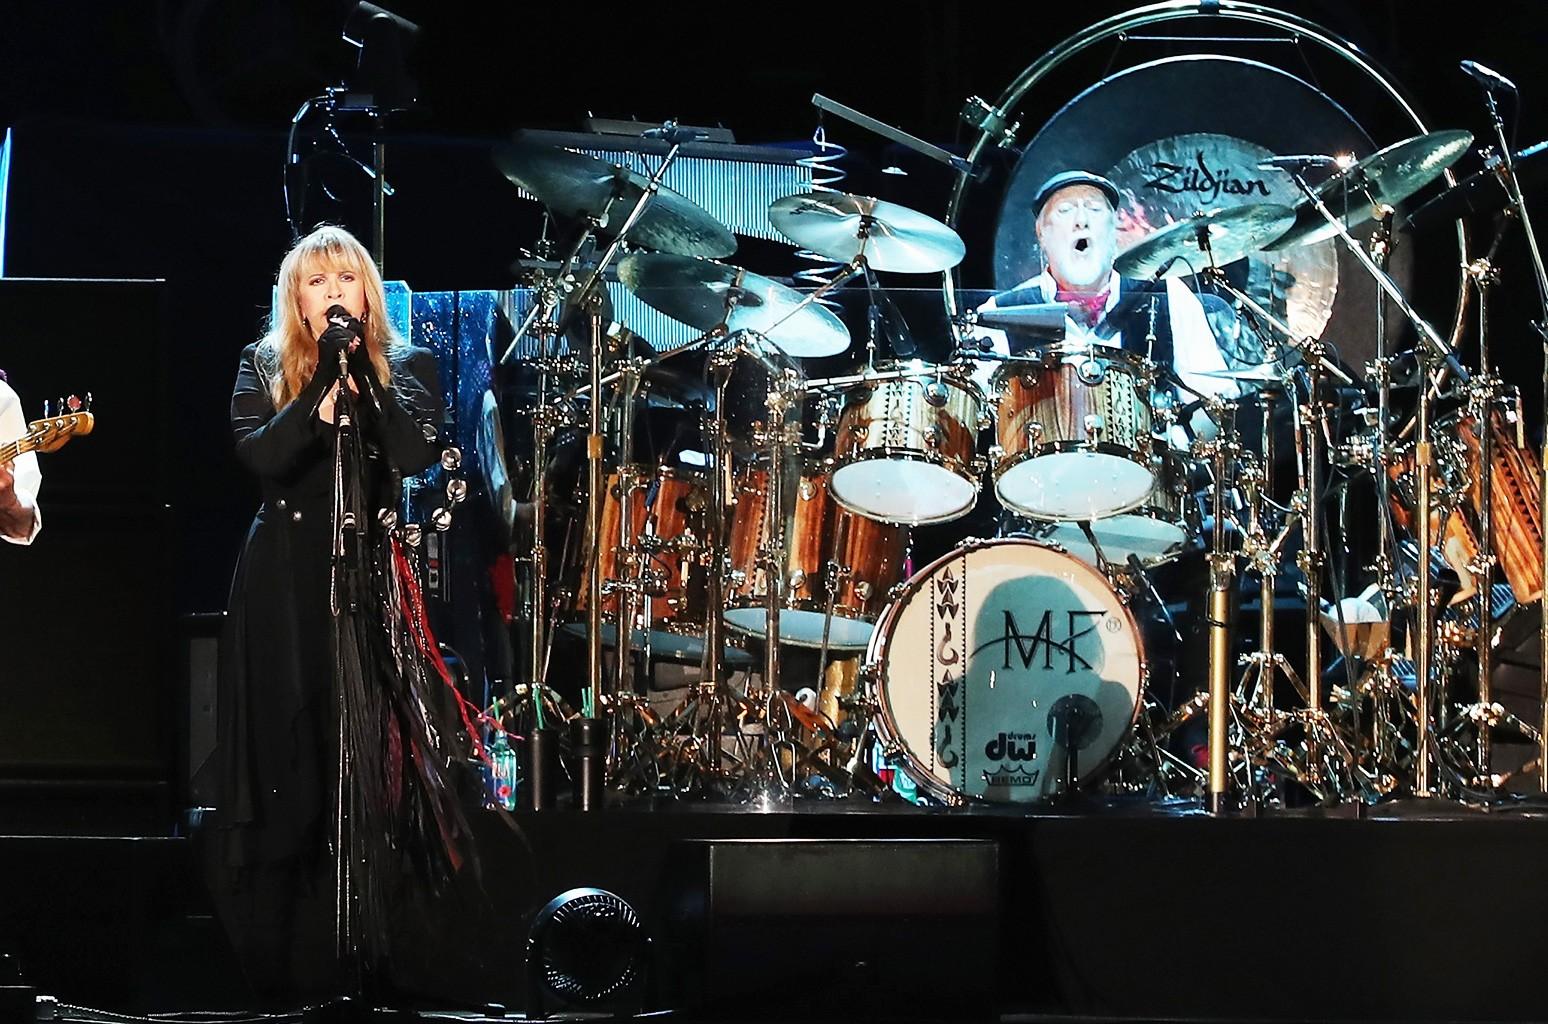 Stevie Nicks and Mick Fleetwood of Fleetwood Mac